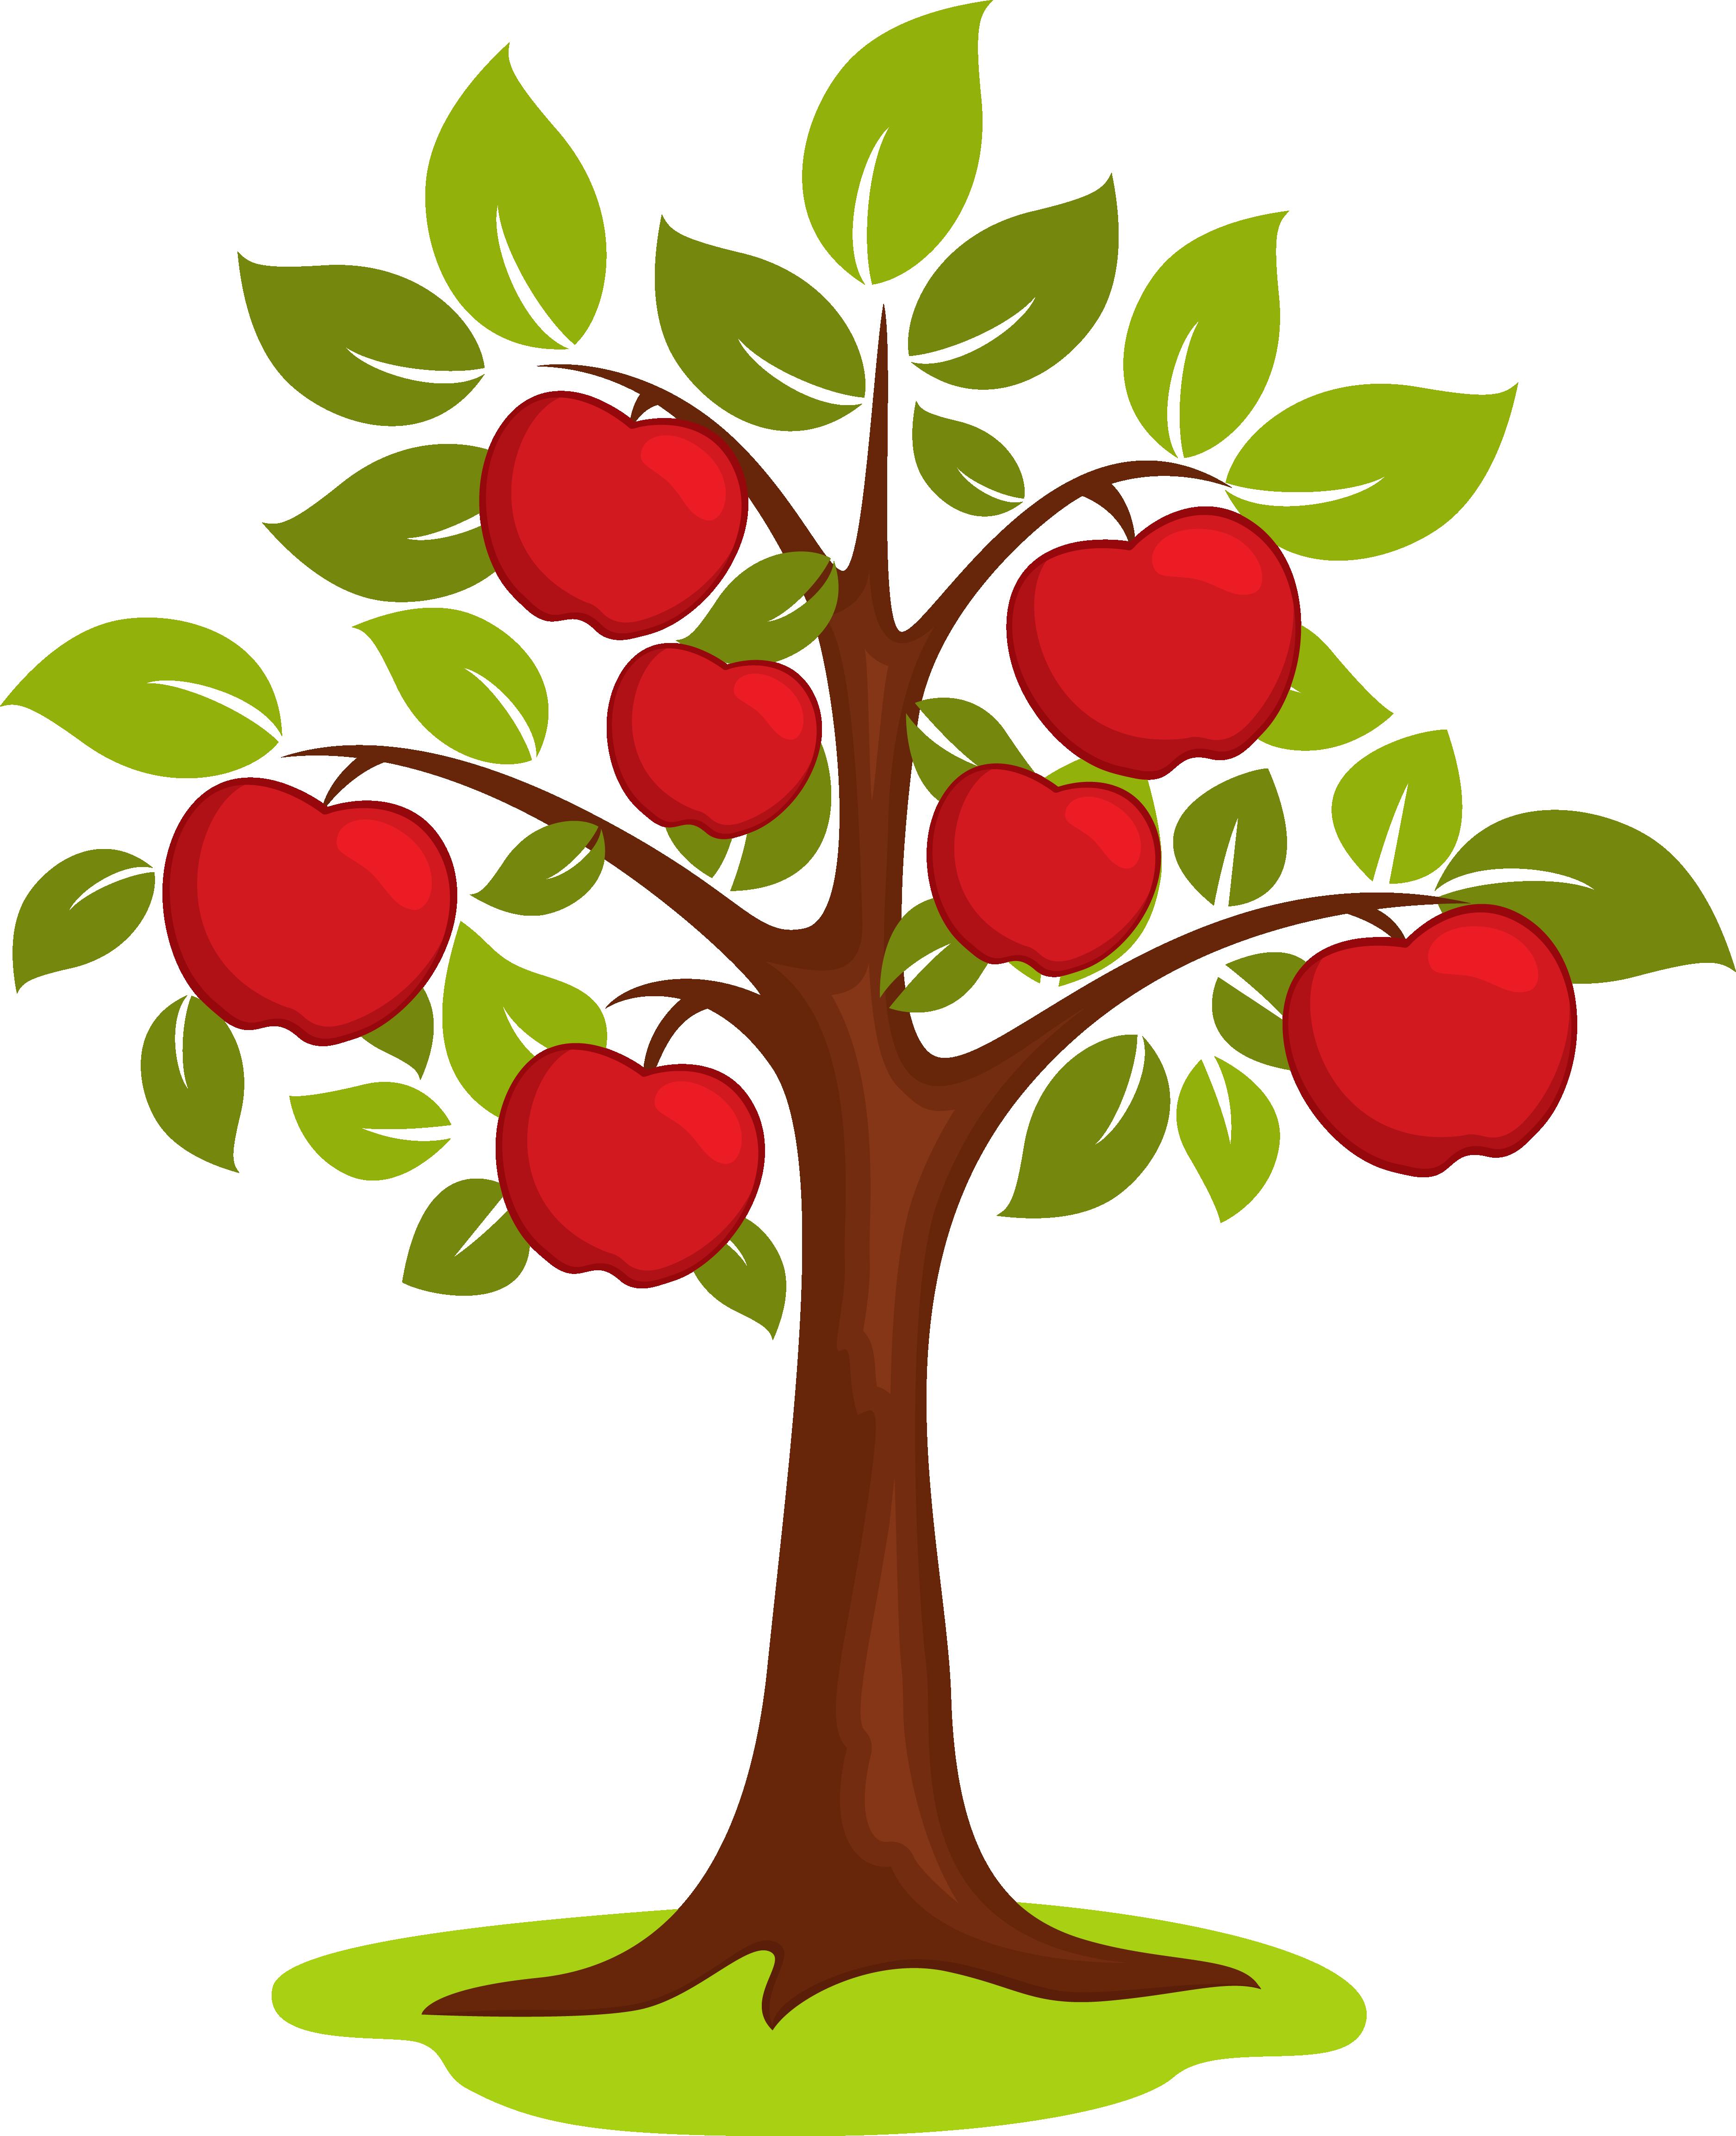 Cartoon clip art vector. Foods clipart tree